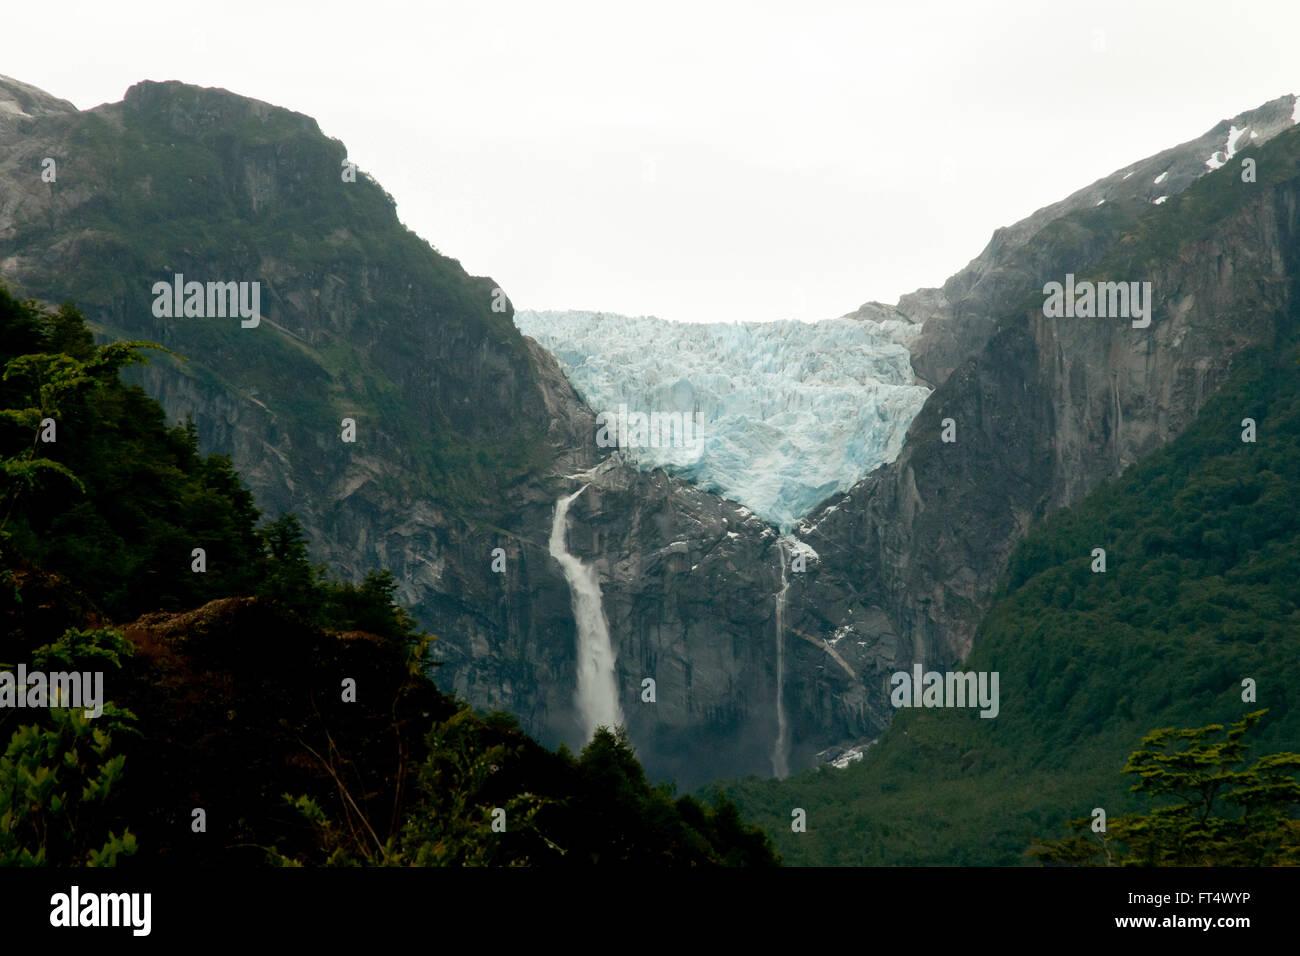 Hanging Glacier - Queulat National Park - Chile - Stock Image